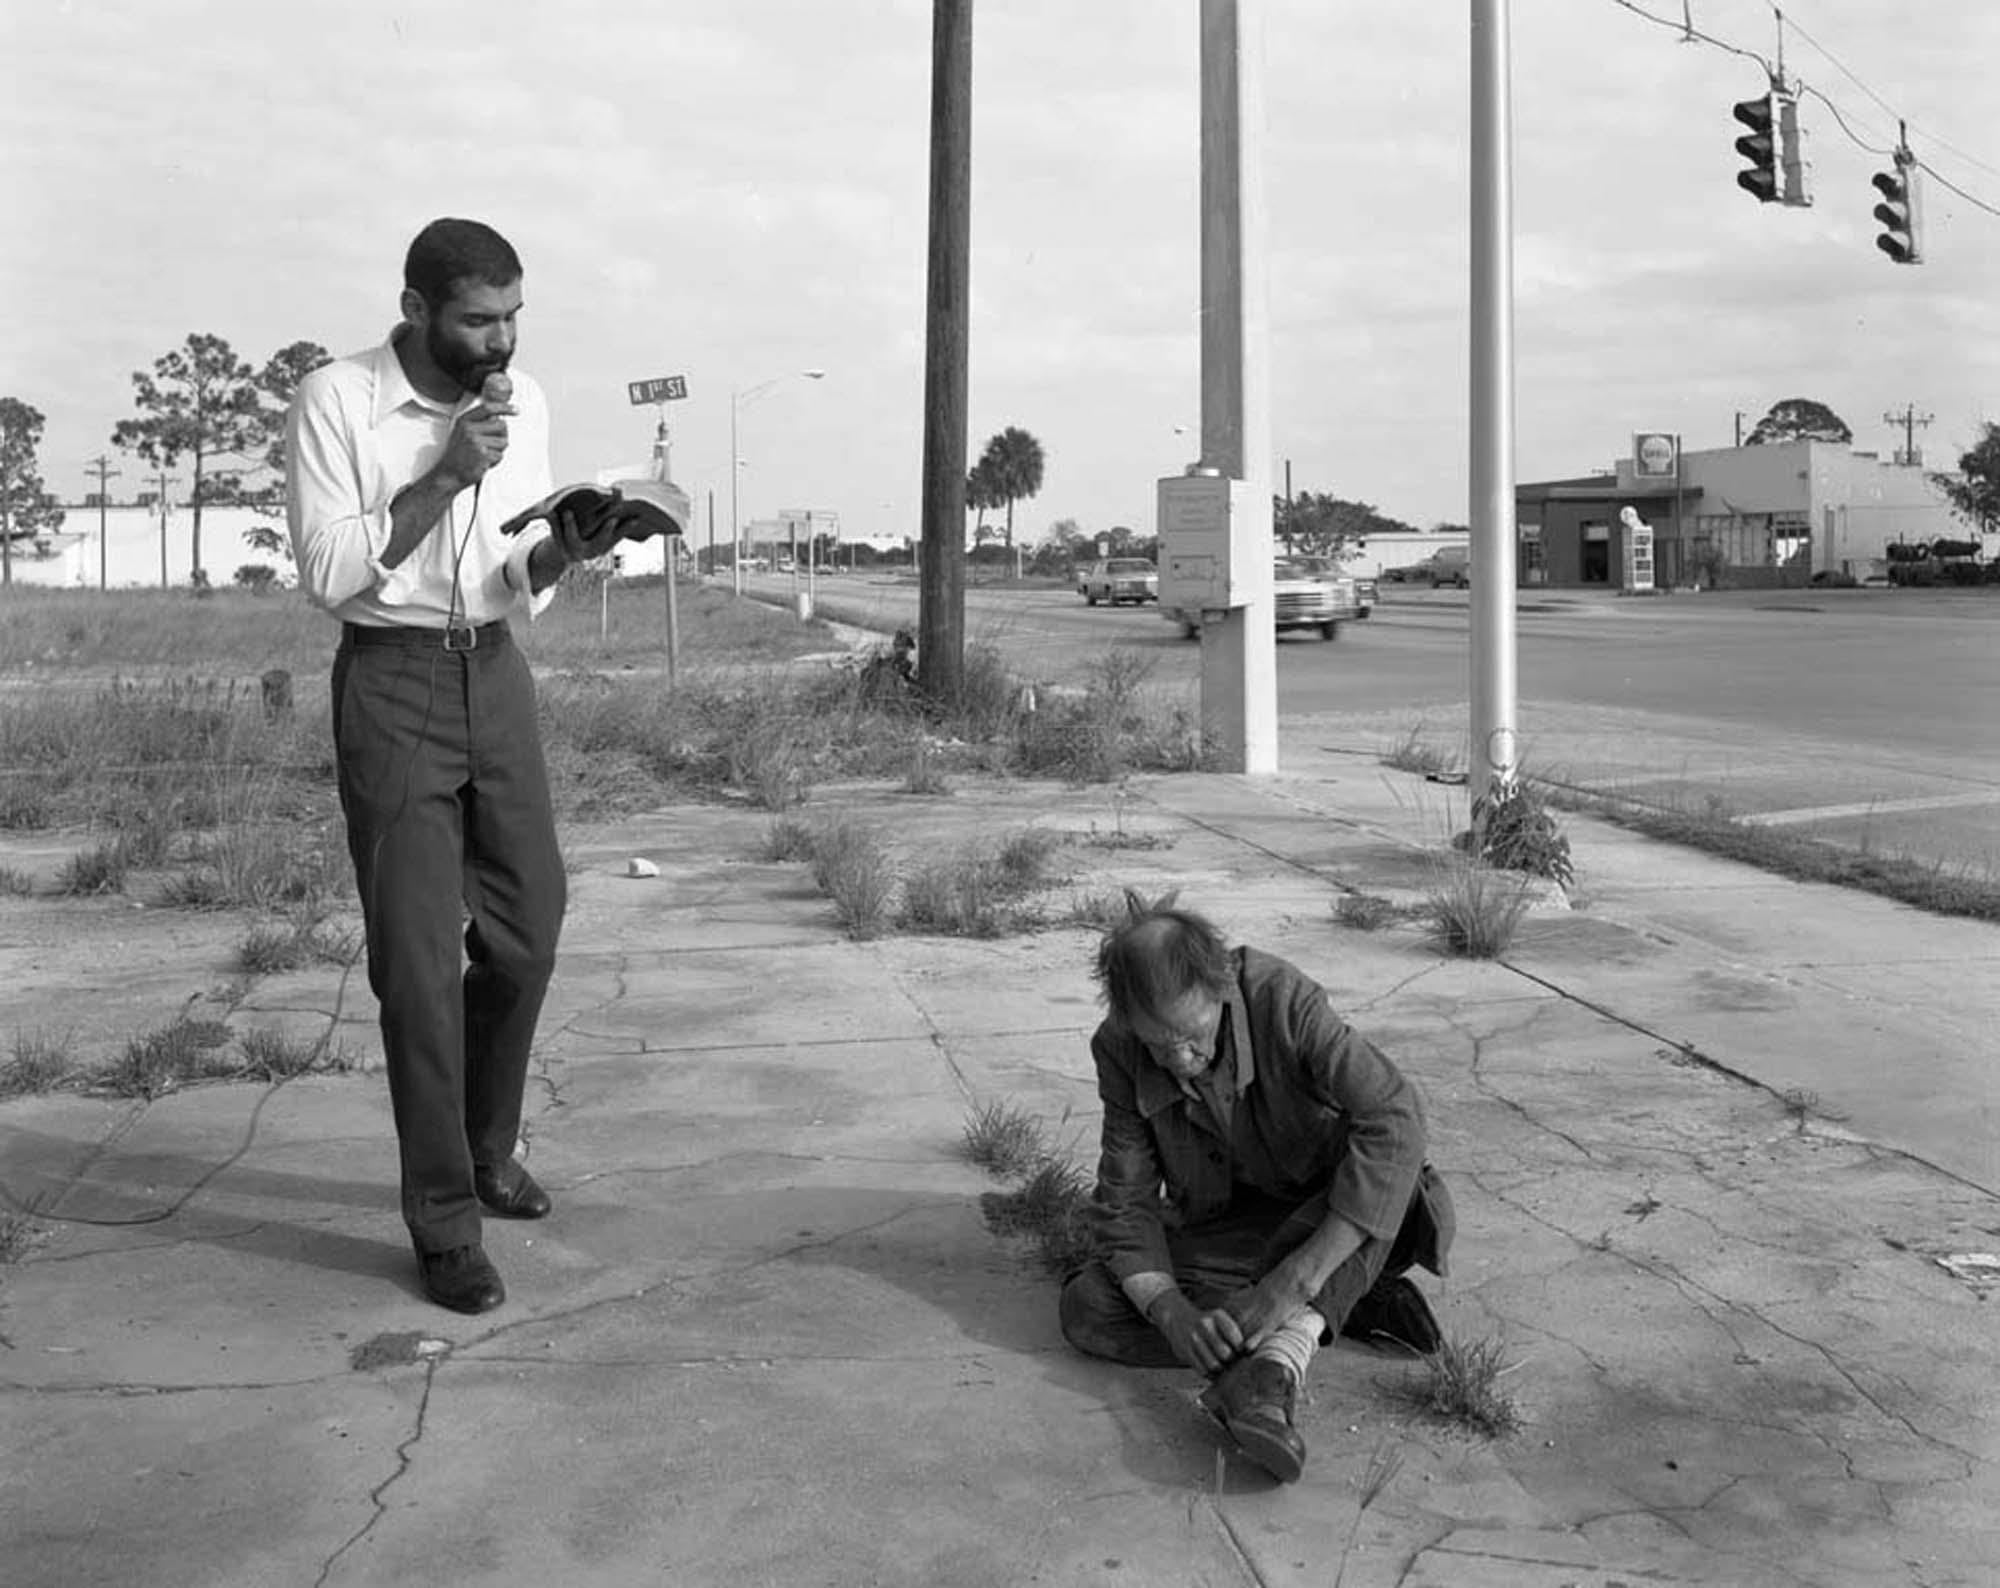 Preacher, Imokolee, Fla., 1986.